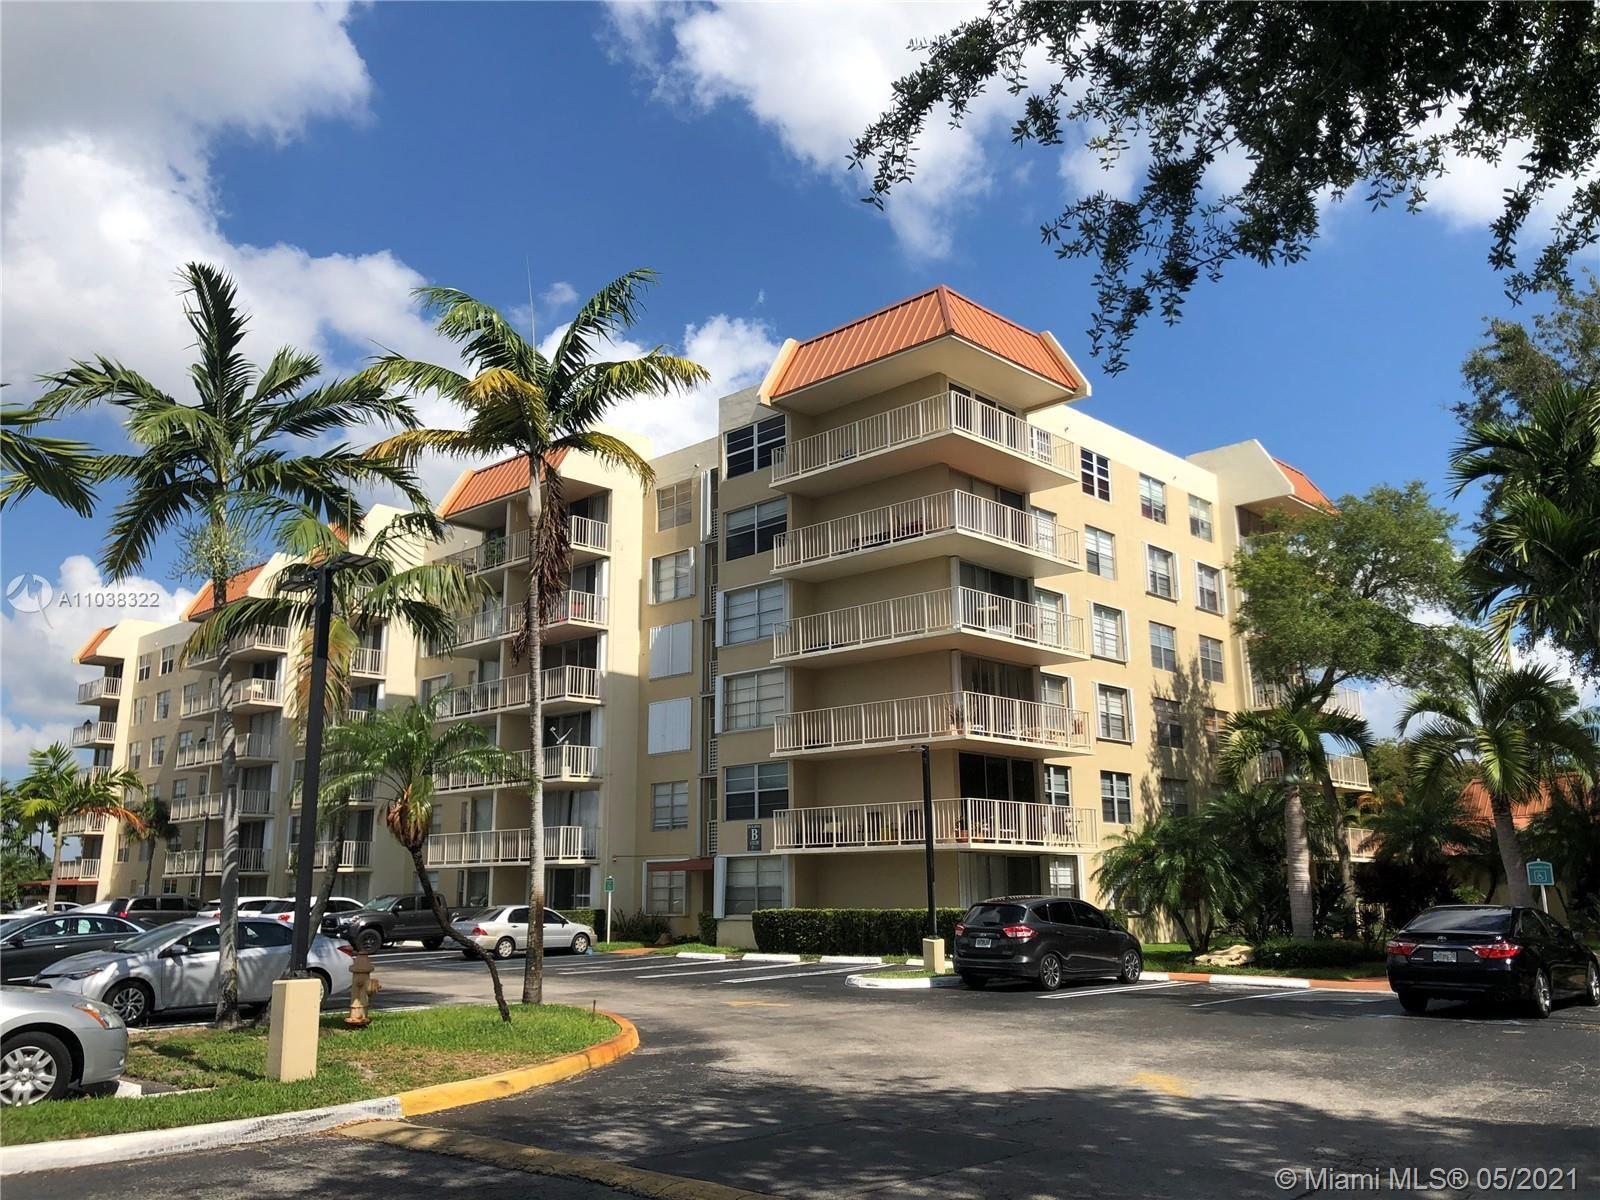 13120 SW 92nd Ave #403B, Miami, FL 33176 - #: A11038322